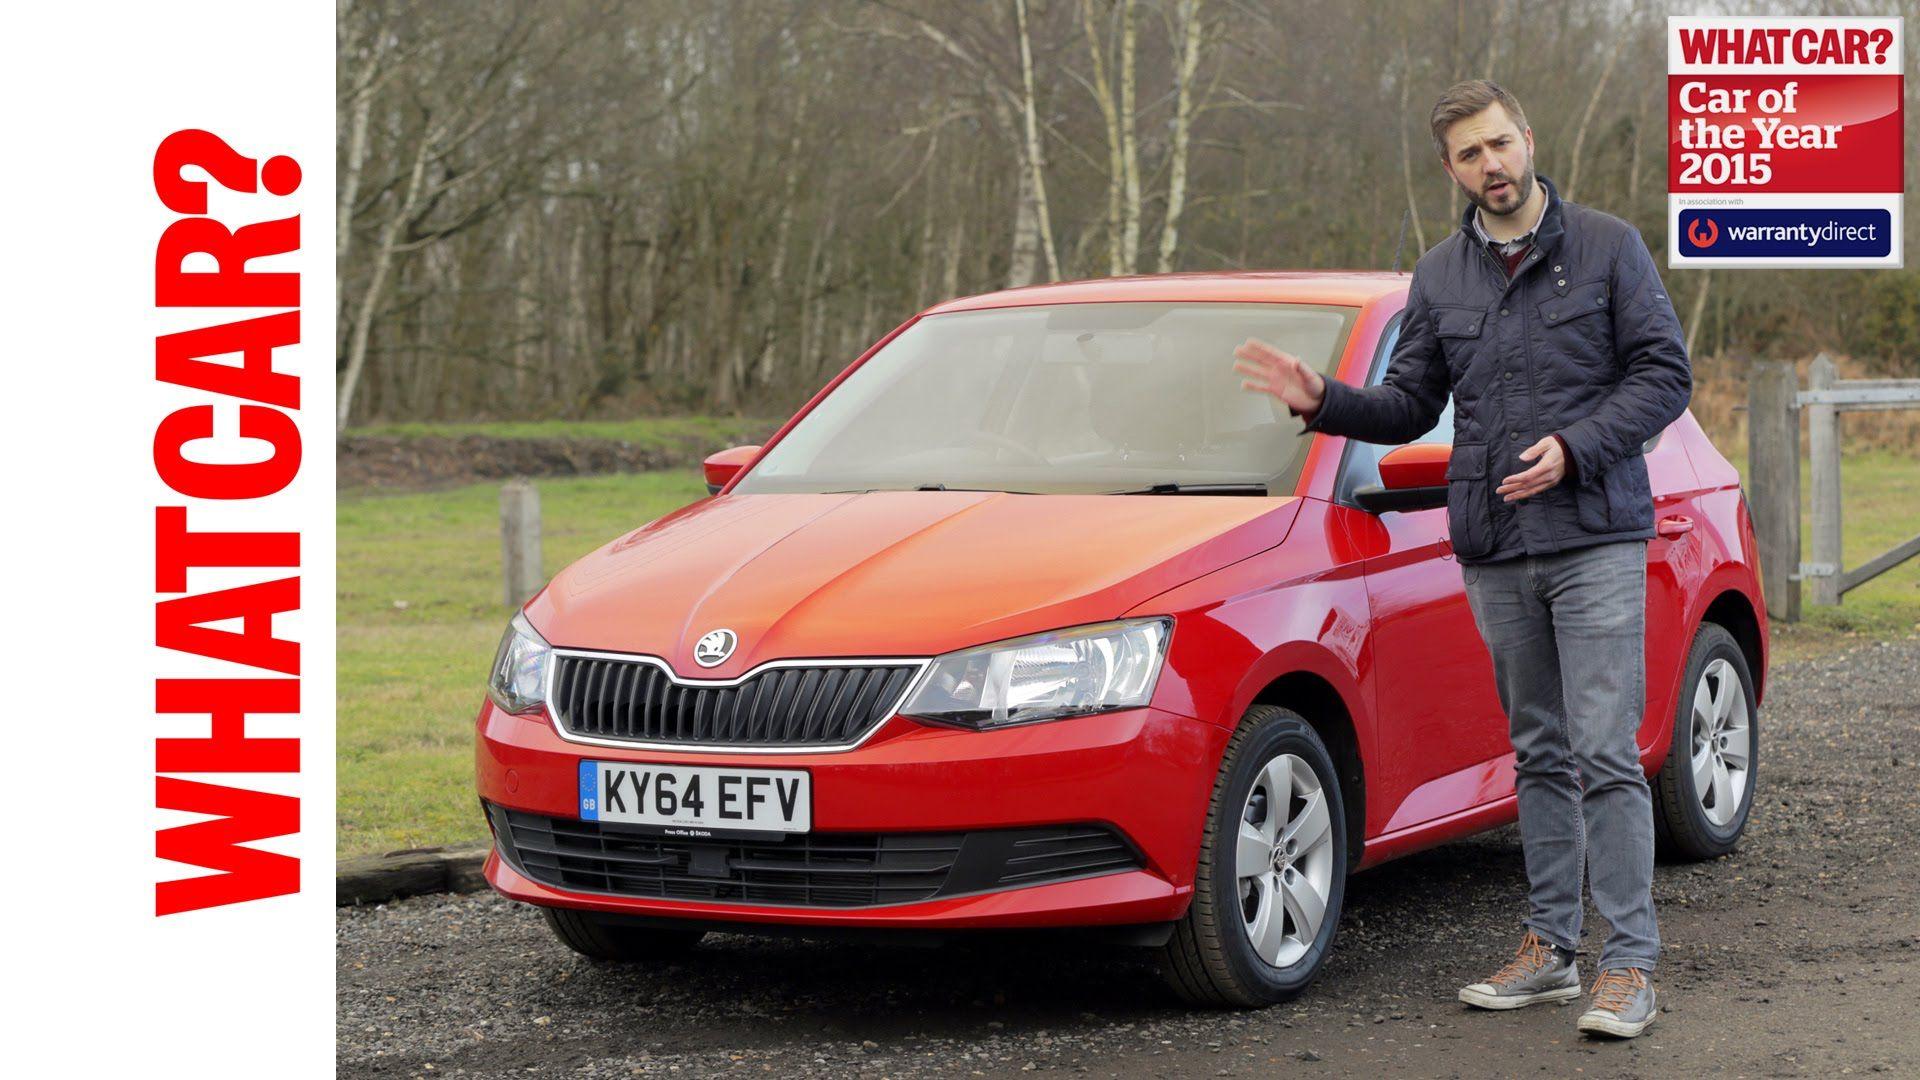 2015 Skoda Fabia review What Car Cheap Used Cars Hq